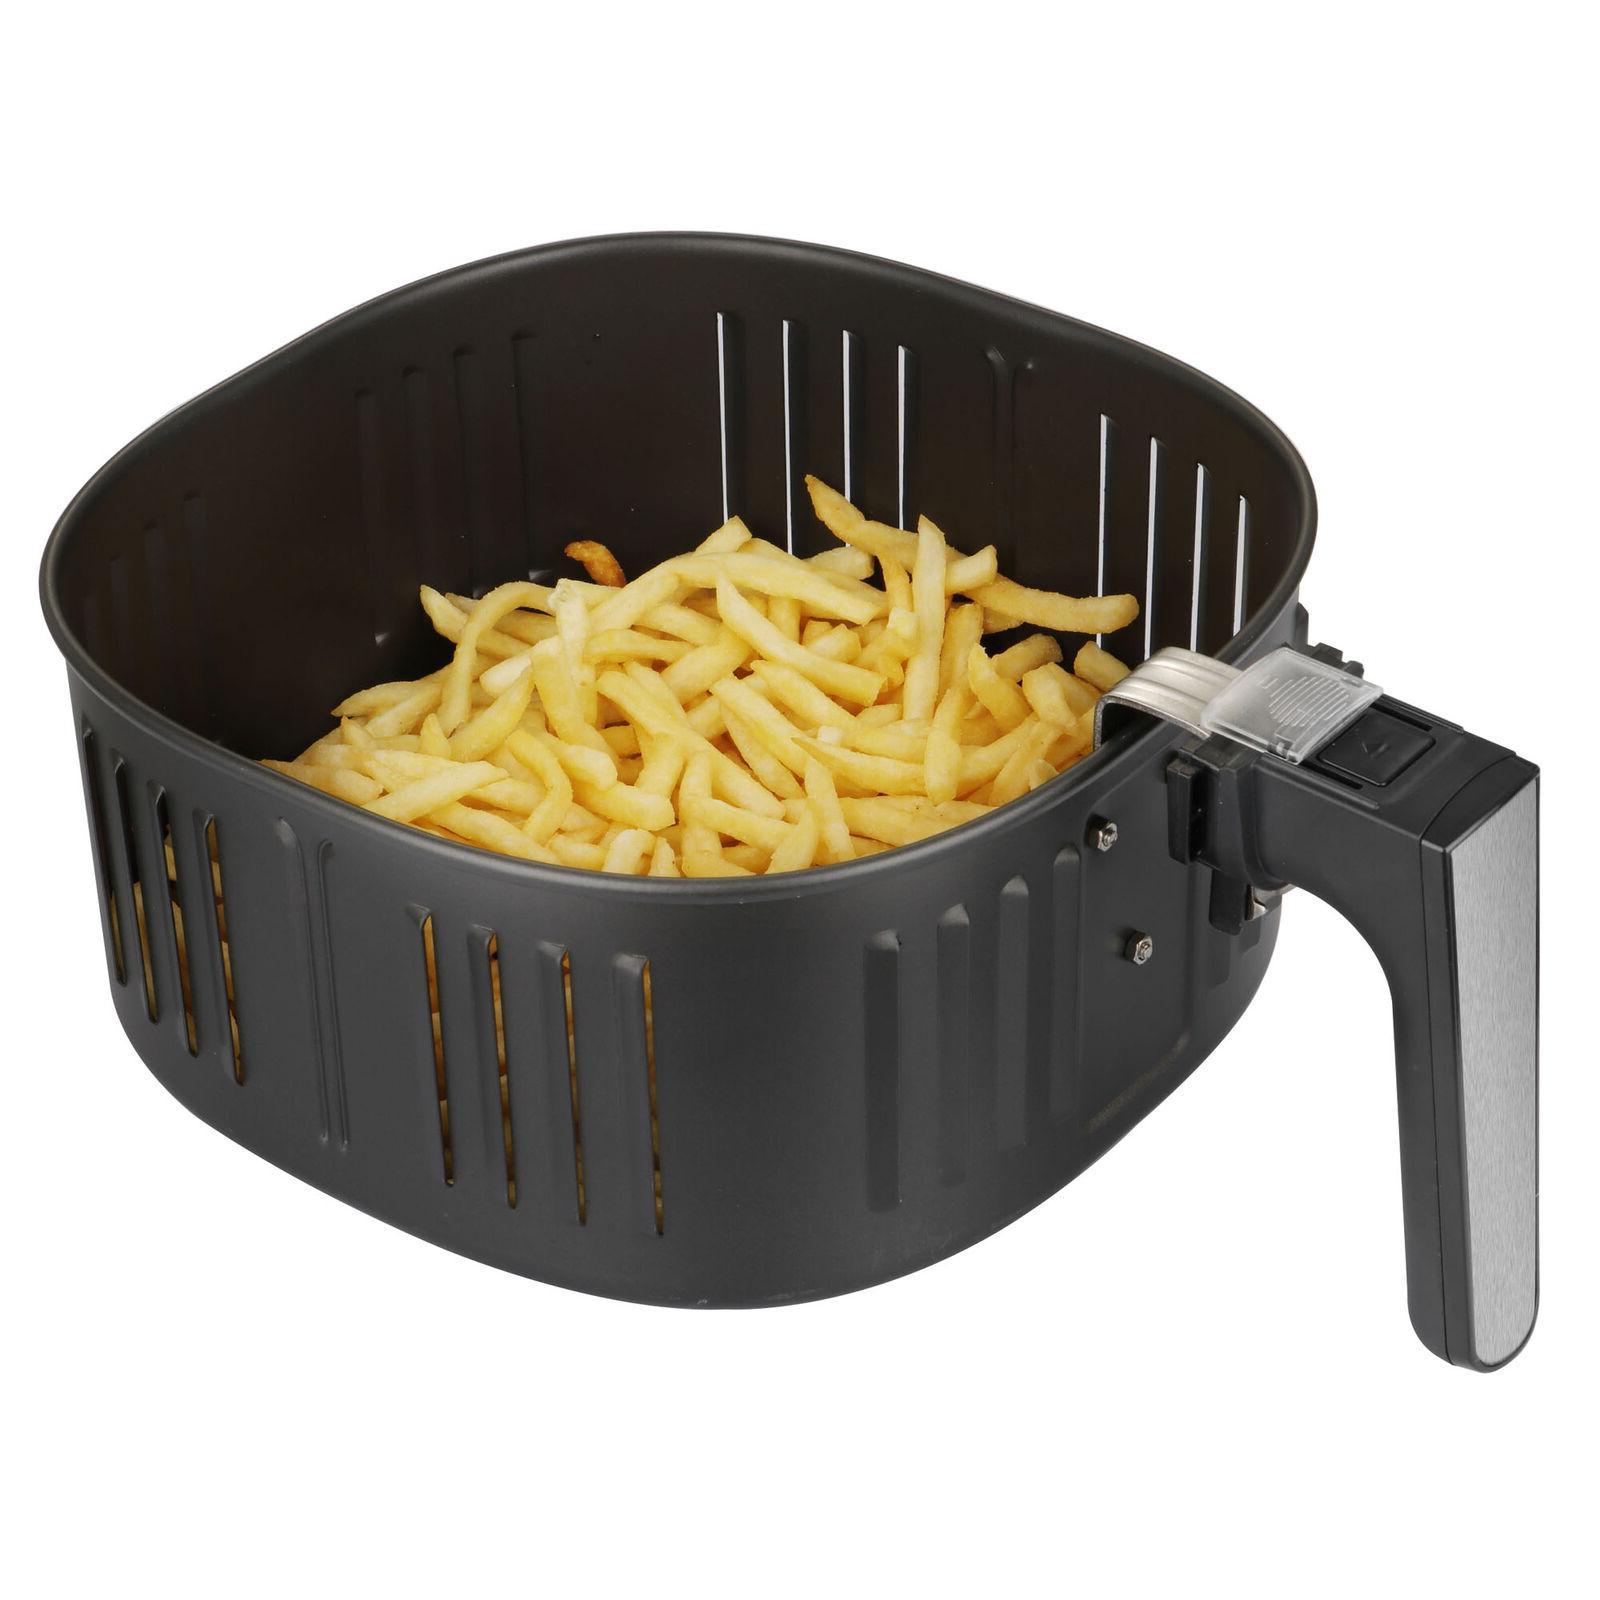 7.6QT Large Fryer w/Capacity Expansion 1700W Digital Screen